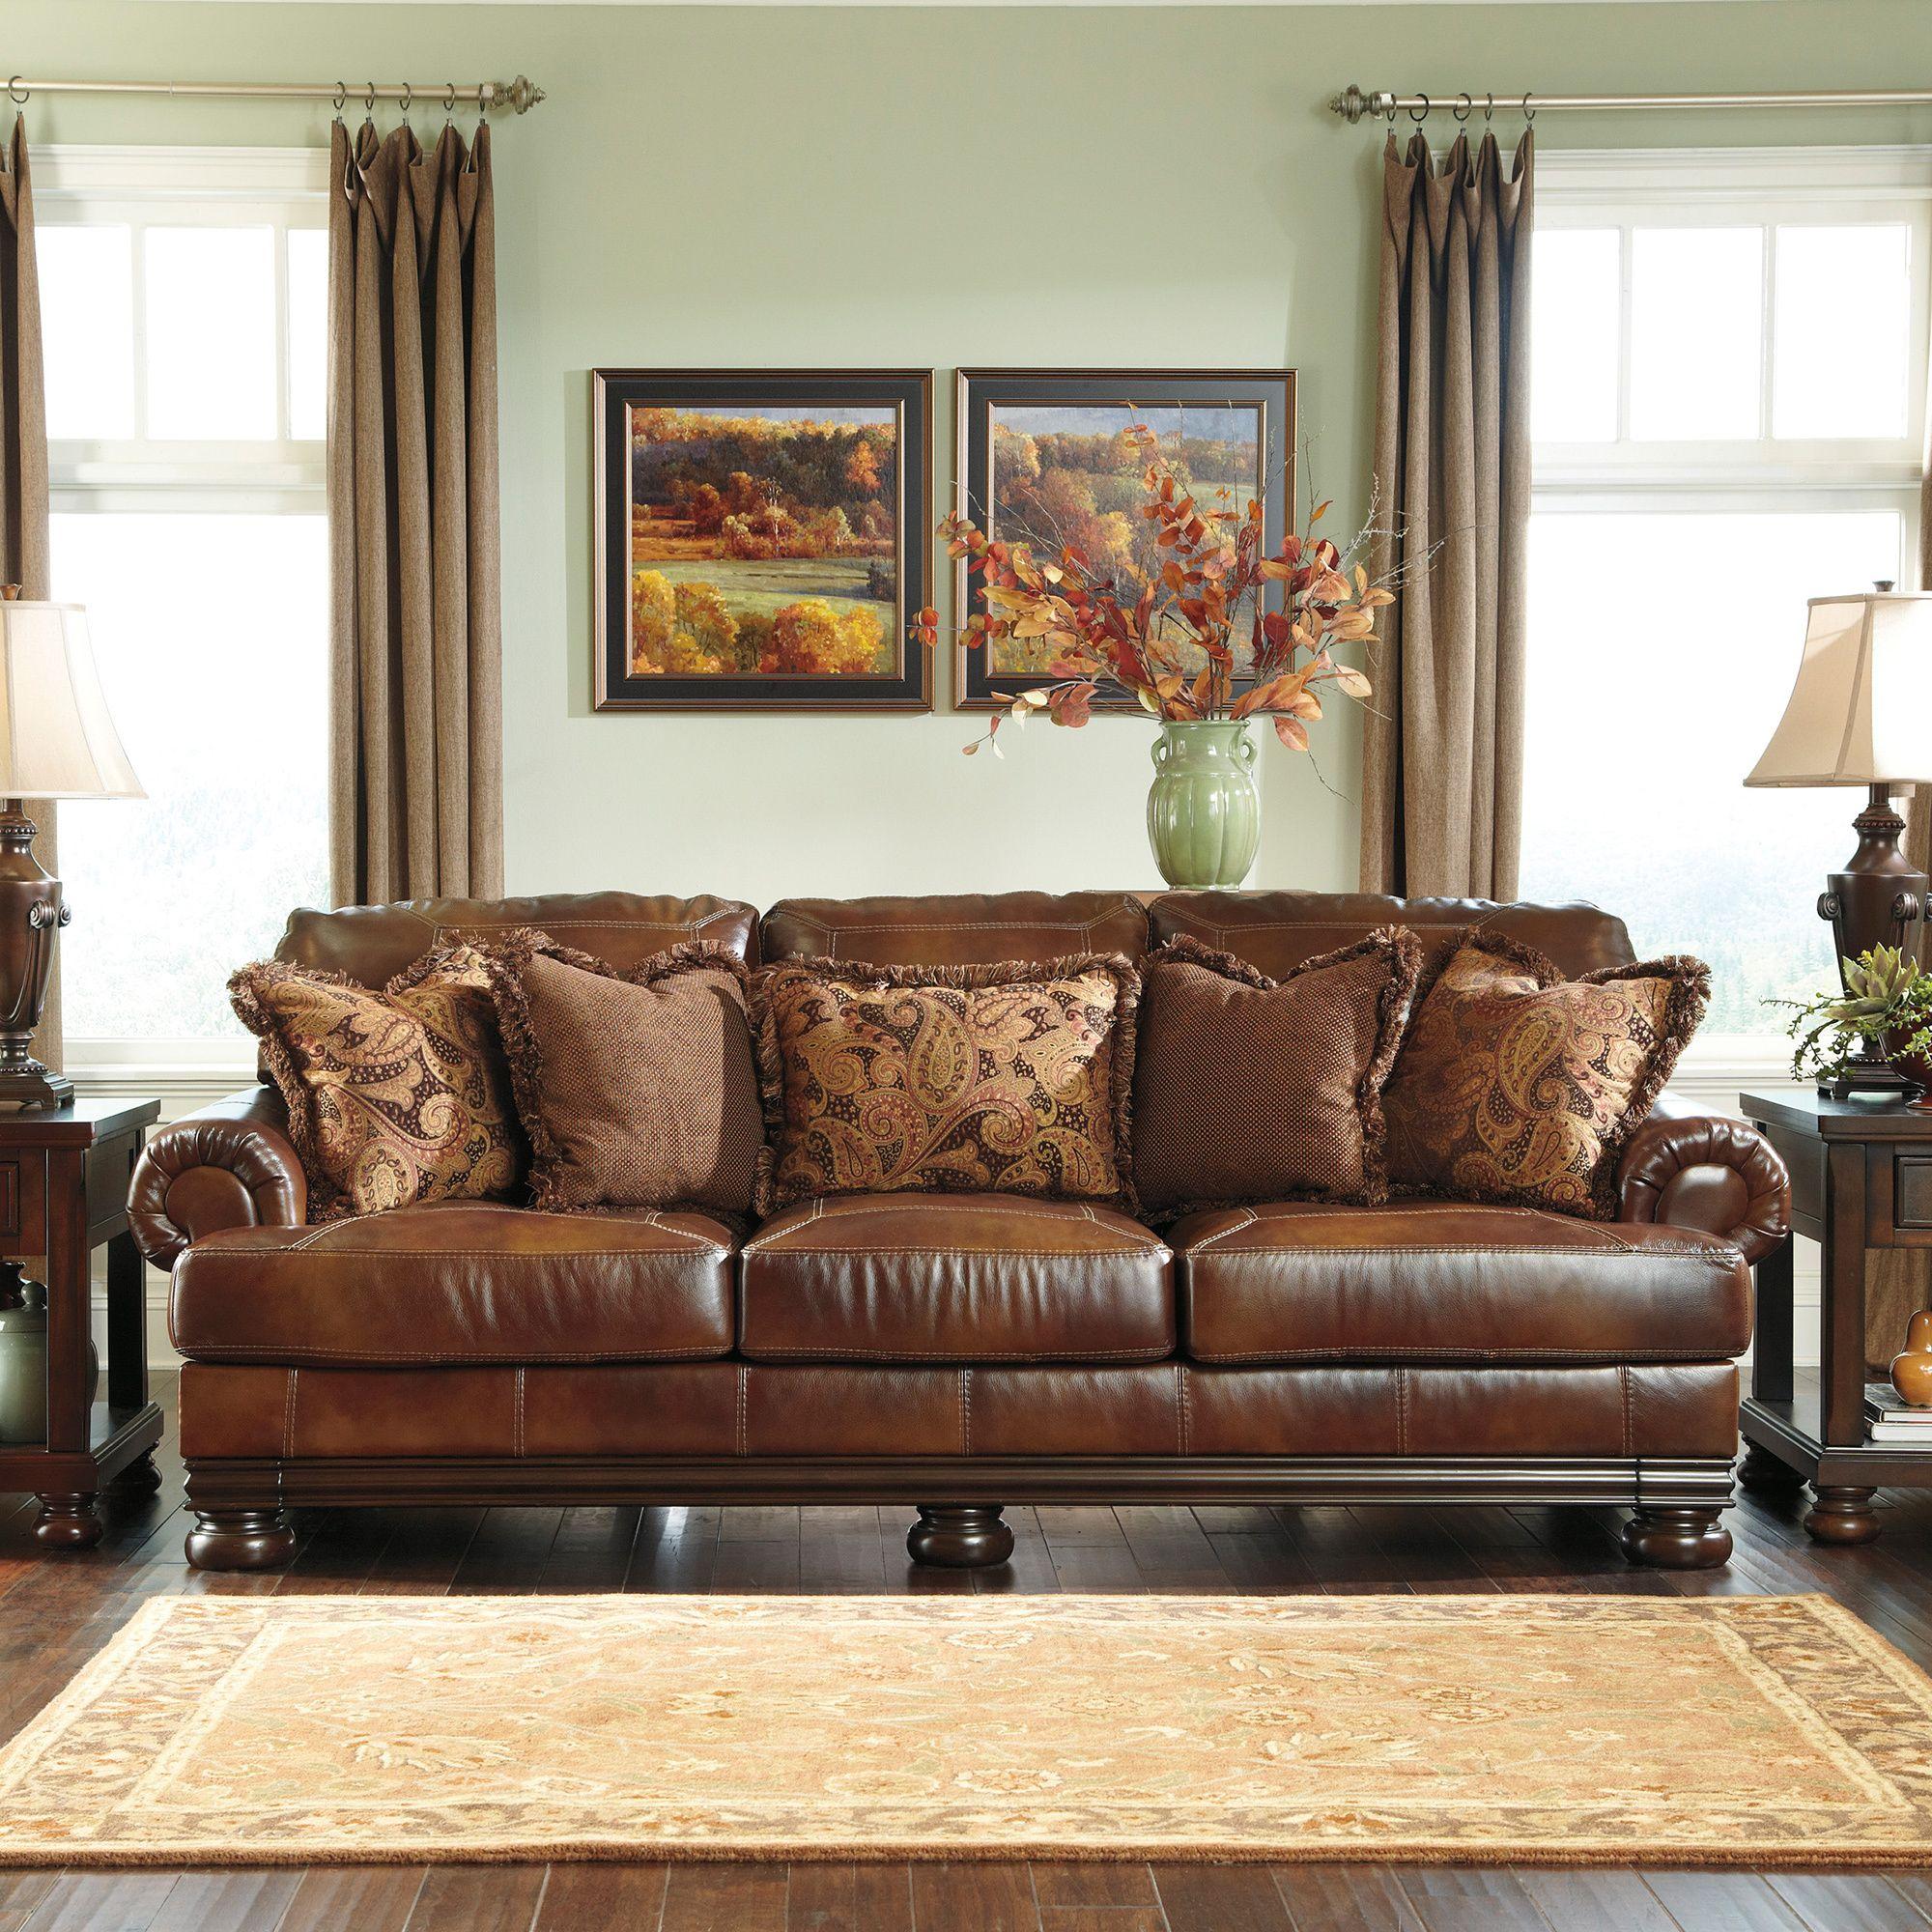 broyhill sofa nebraska furniture mart black velvet modern signature designs by ashley 39hutcherson 39 harness brown